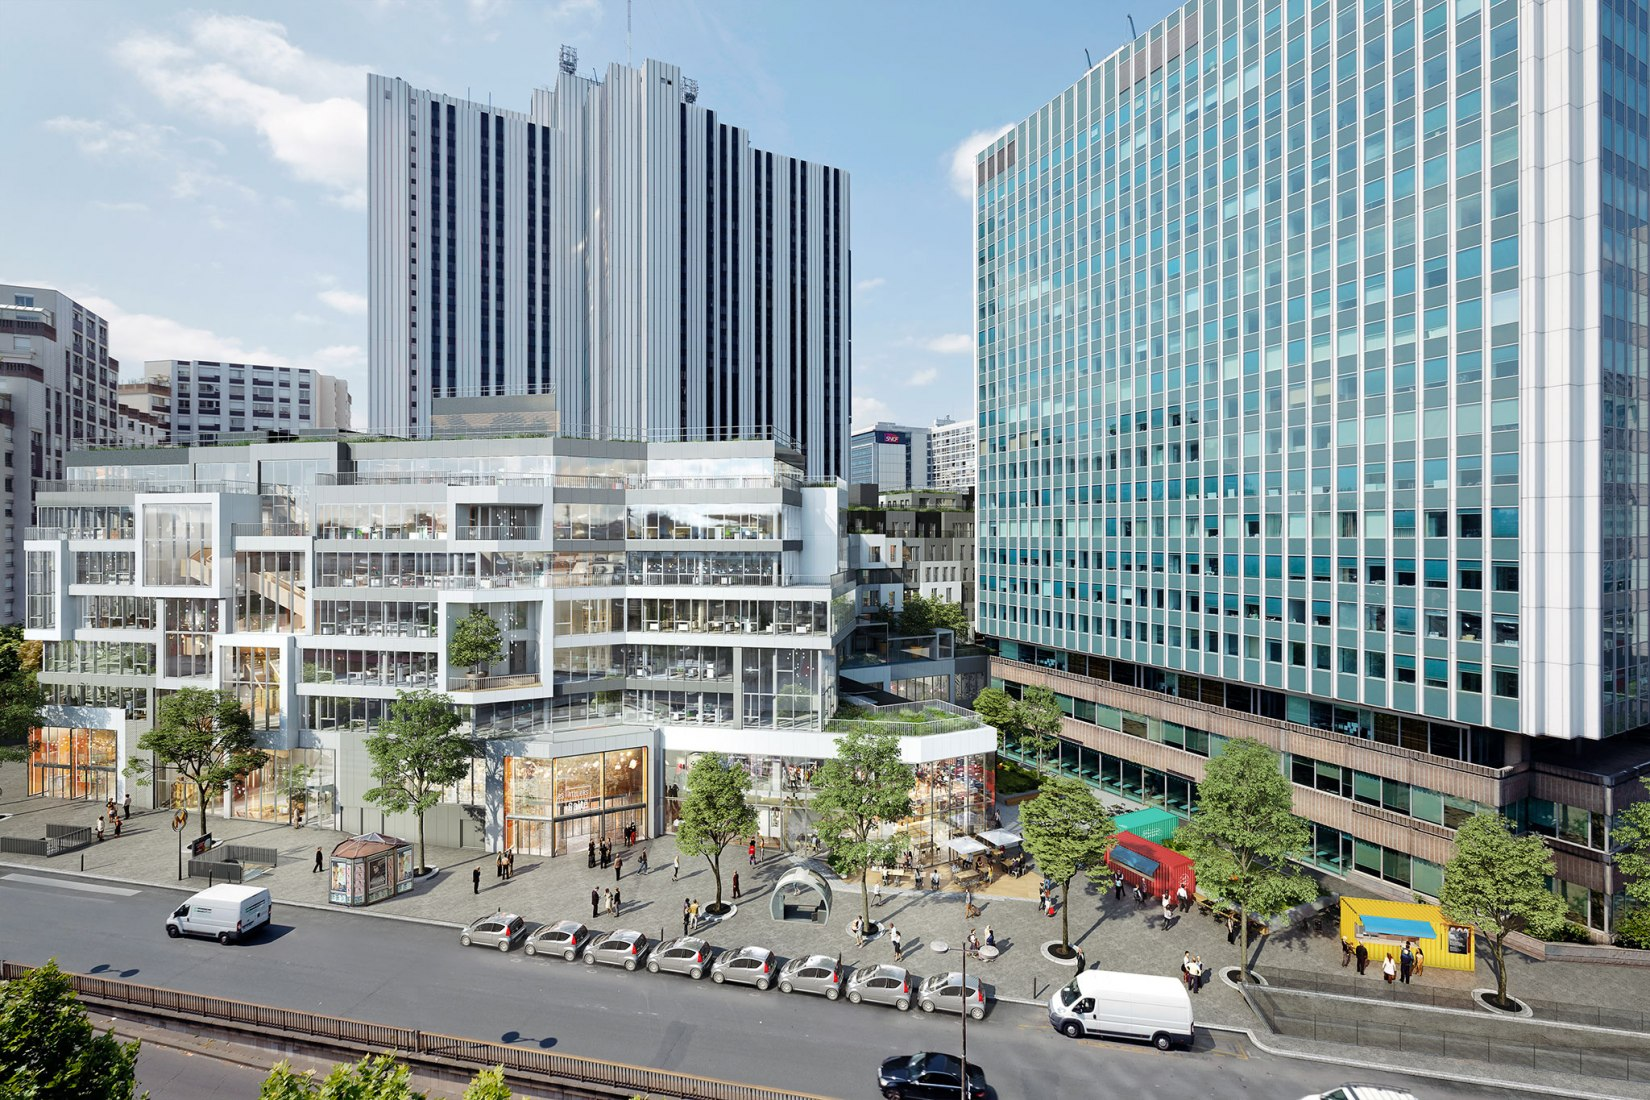 Visualización. Gaîté Montparnasse por MVRDV. Imágen © MVRDV y L'Autre Image